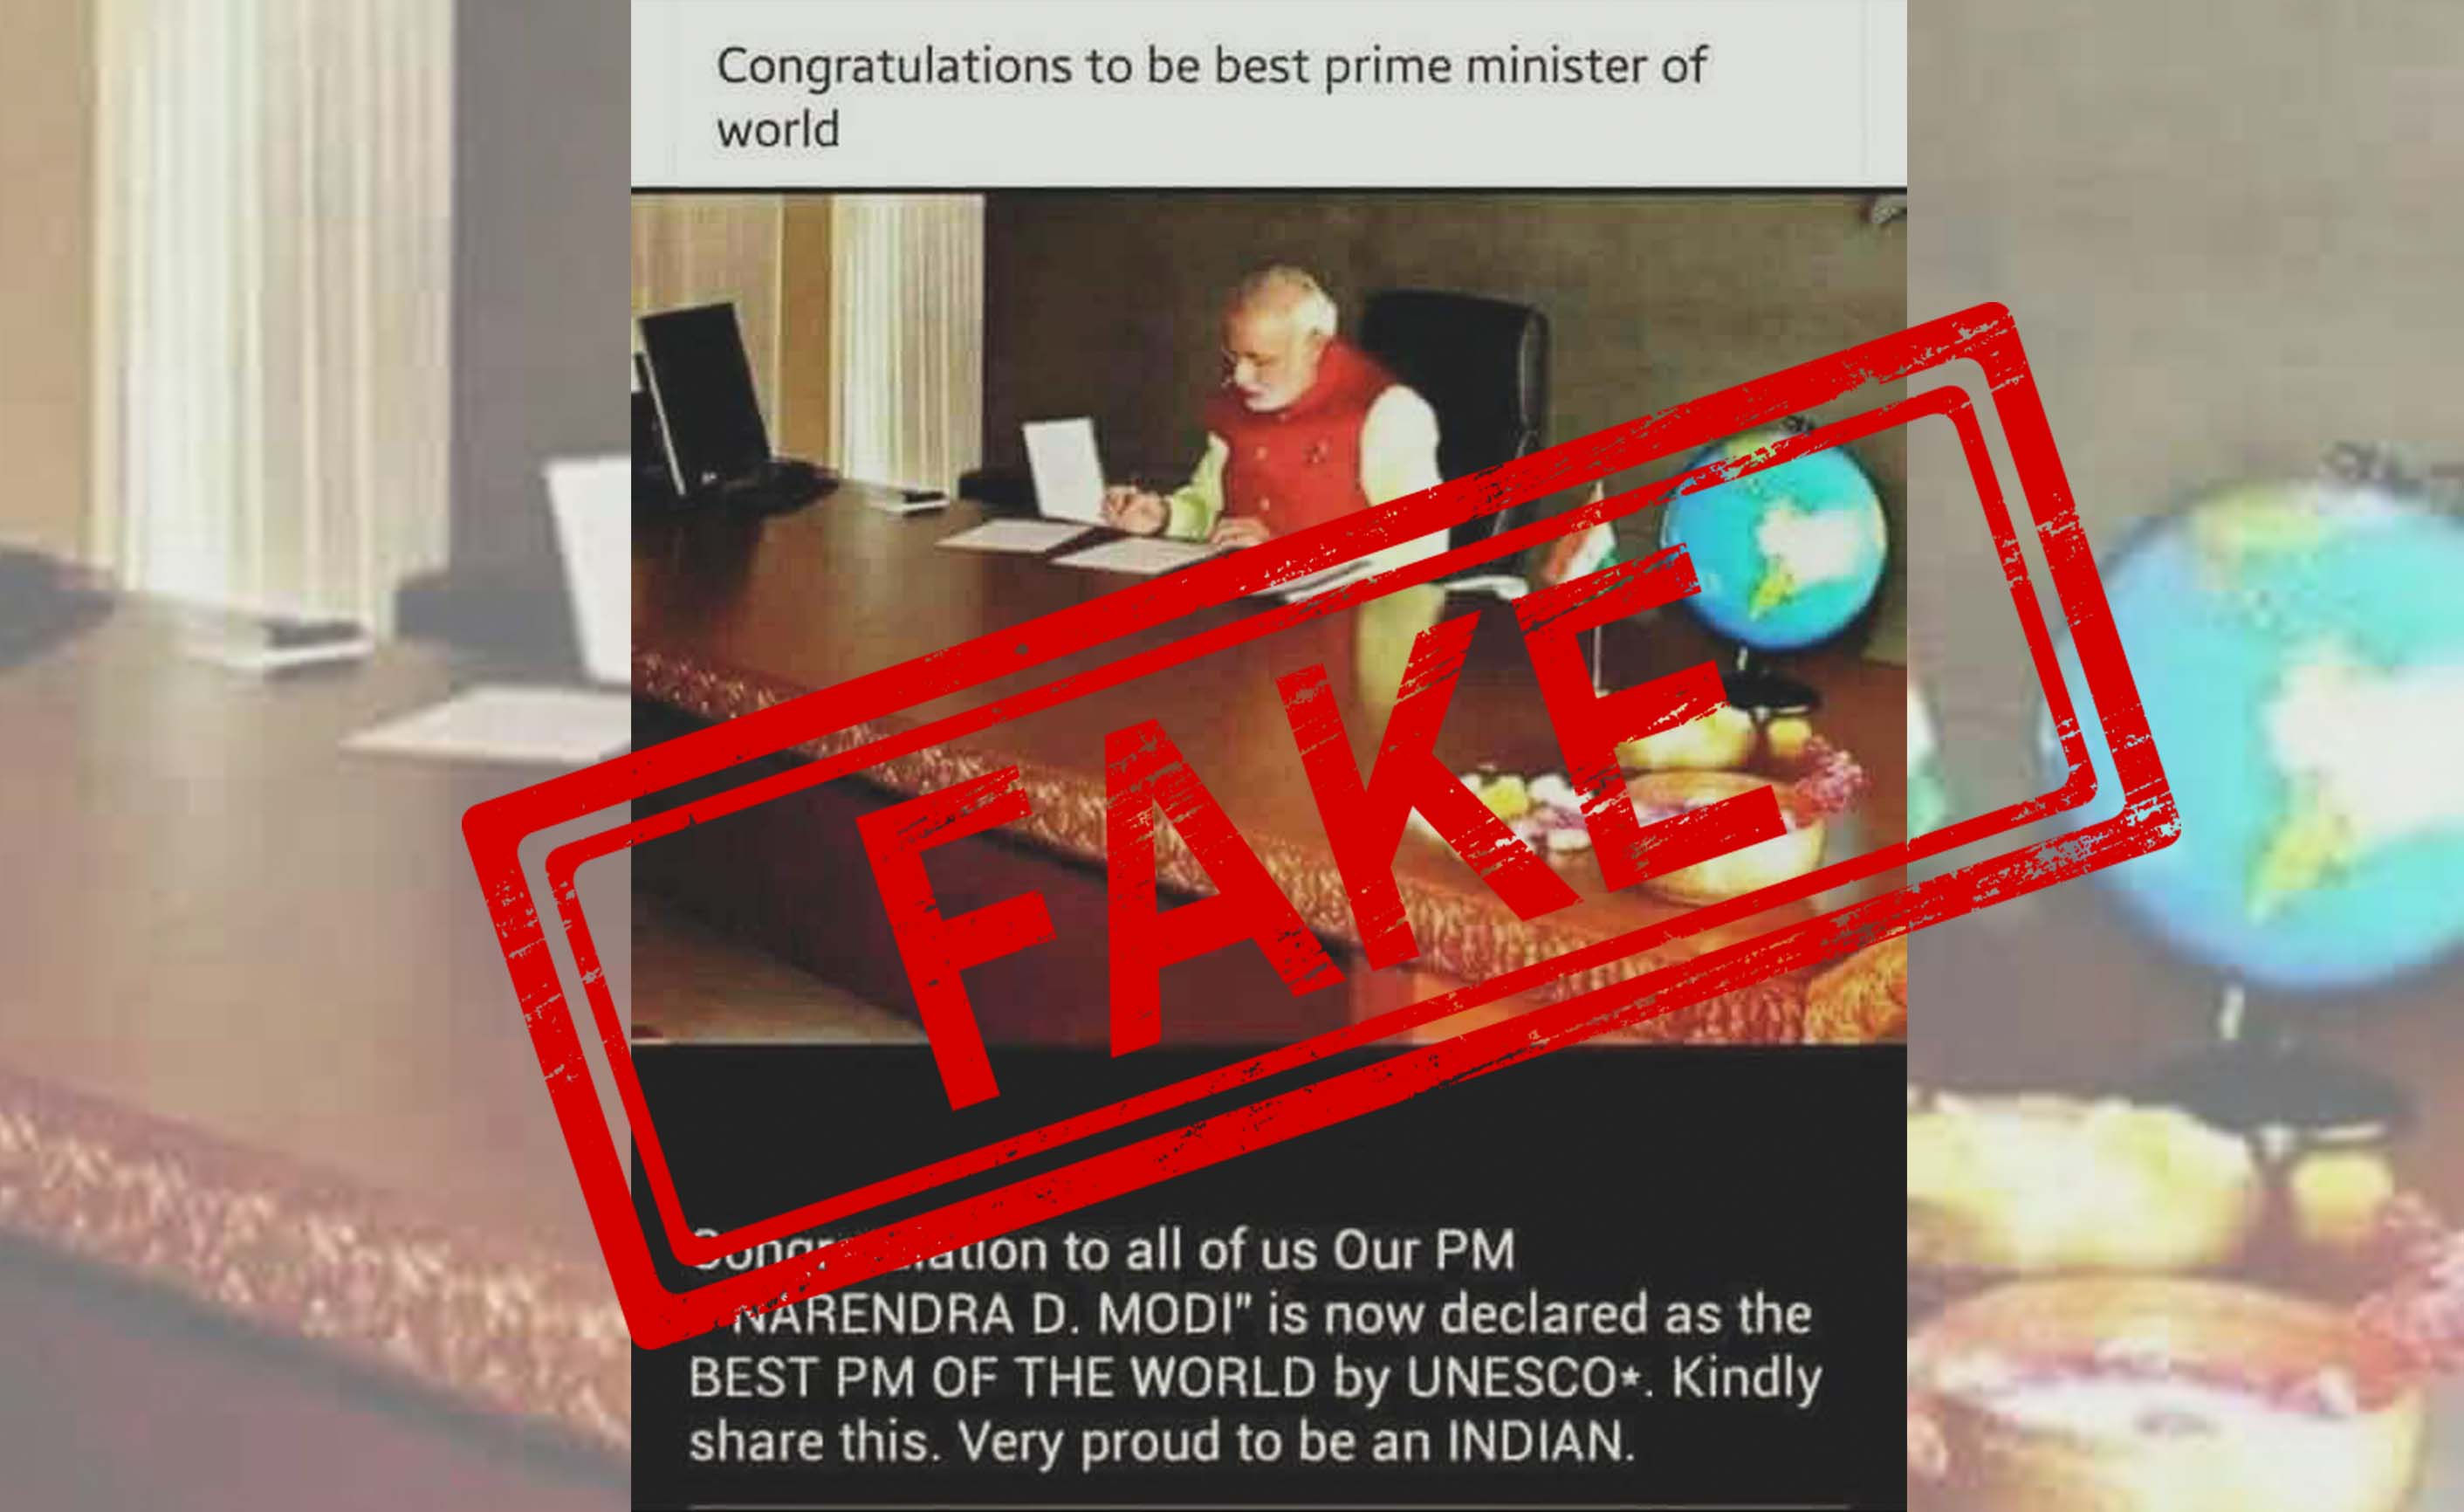 Prime Minister, Narendra Modi, UNESCO, BJP, India, NewsMobile, World, Mobile, news, Fact Check, Fact Checker, Fake